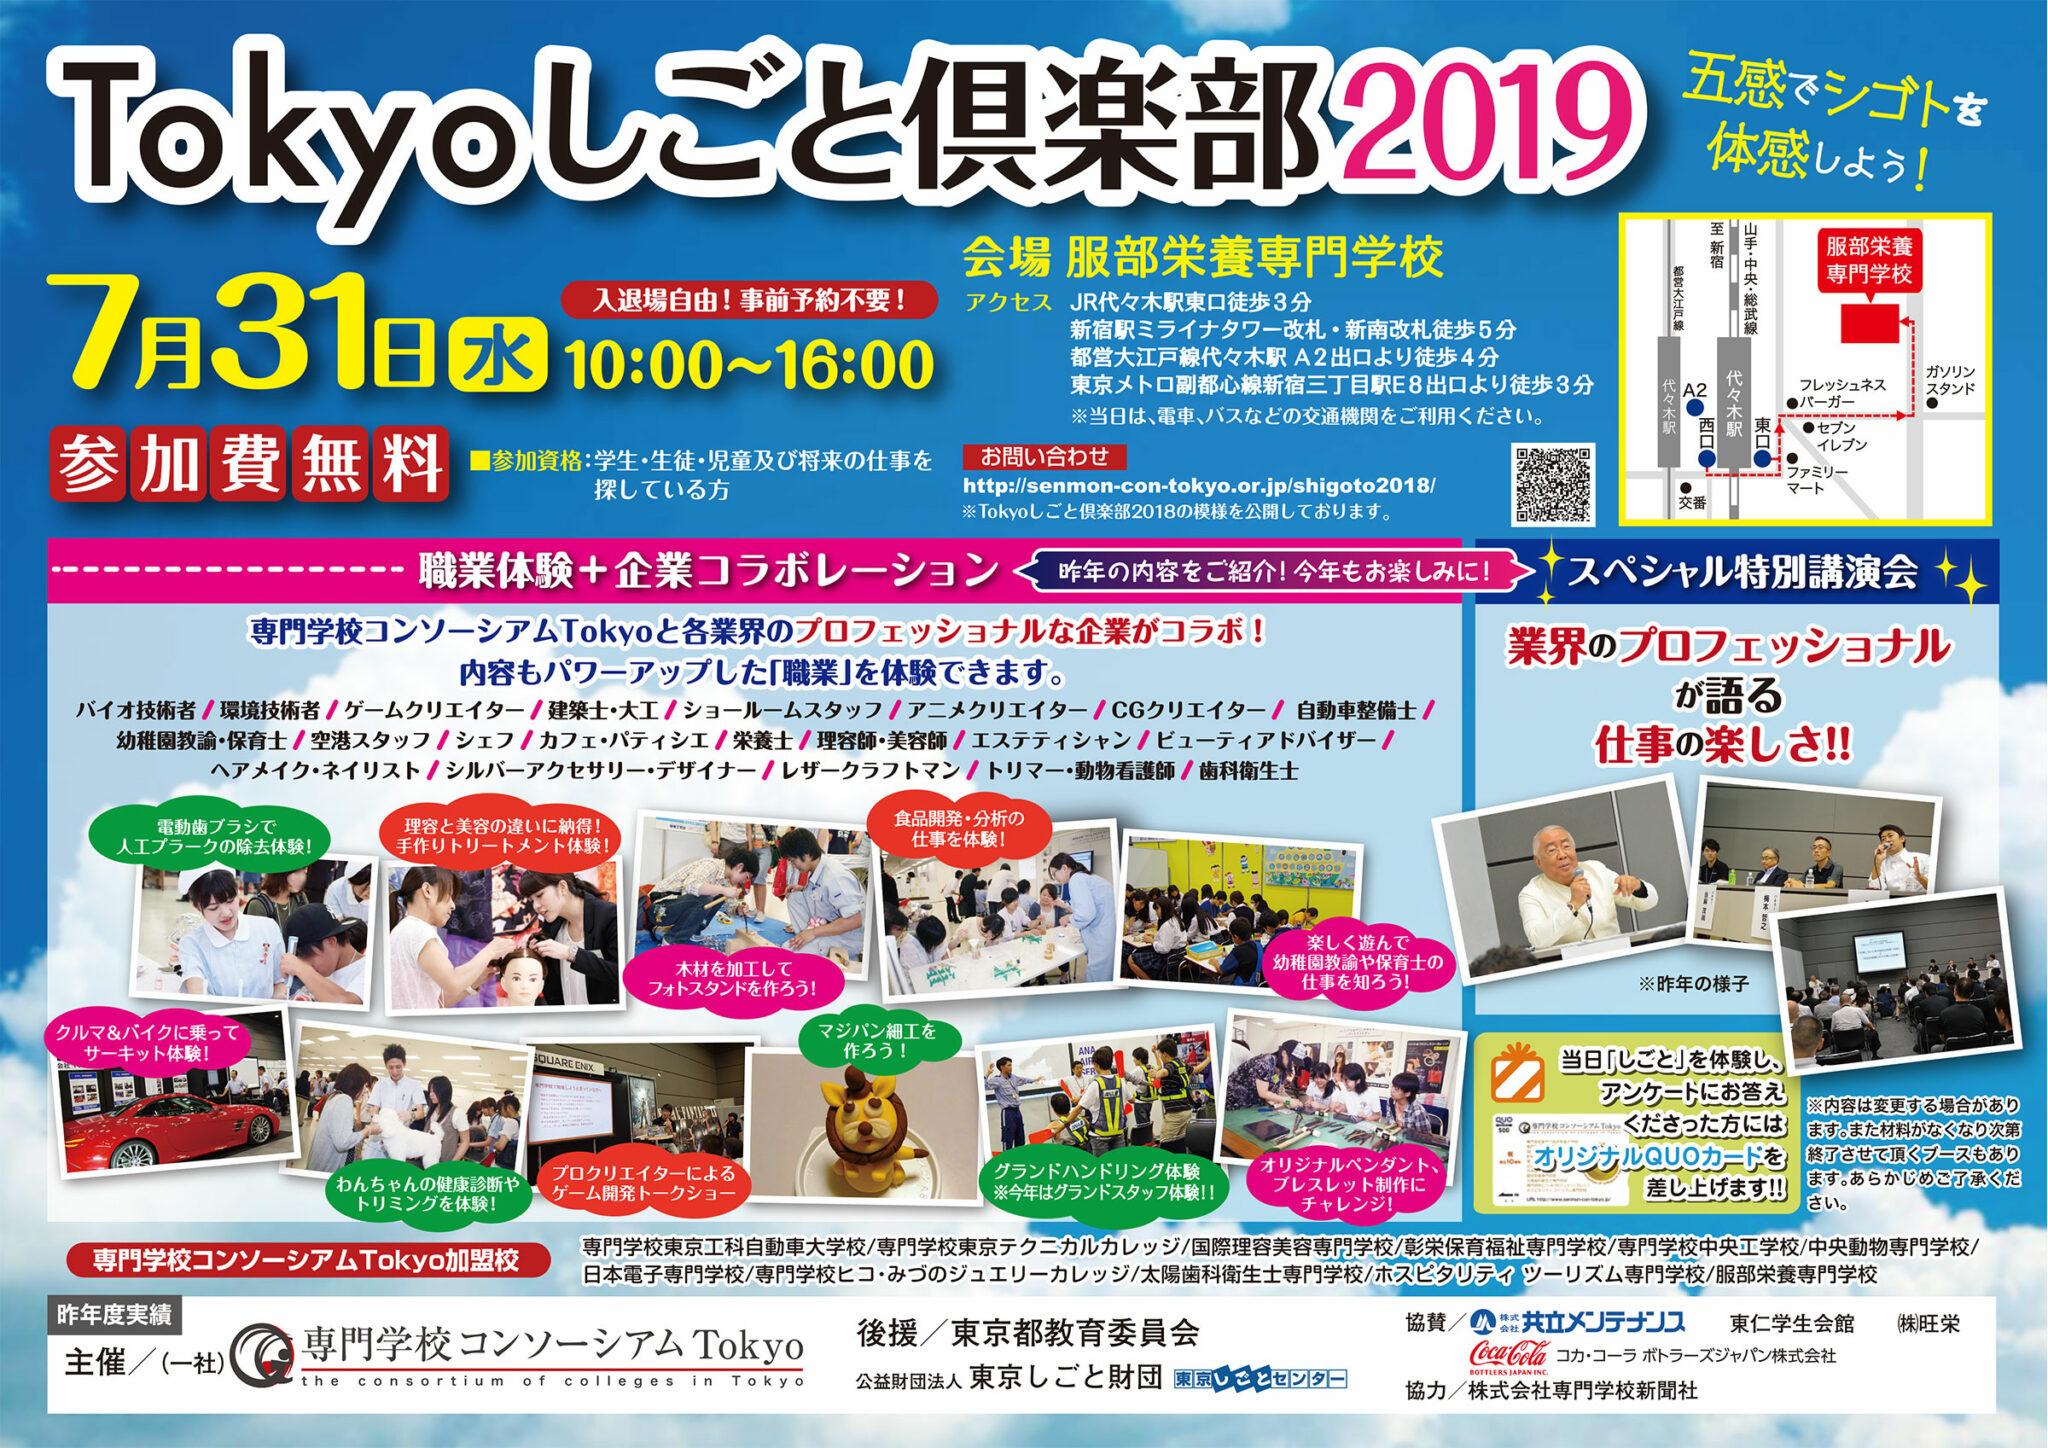 Tokyoしごと倶楽部2019【中央工学校入学相談室】